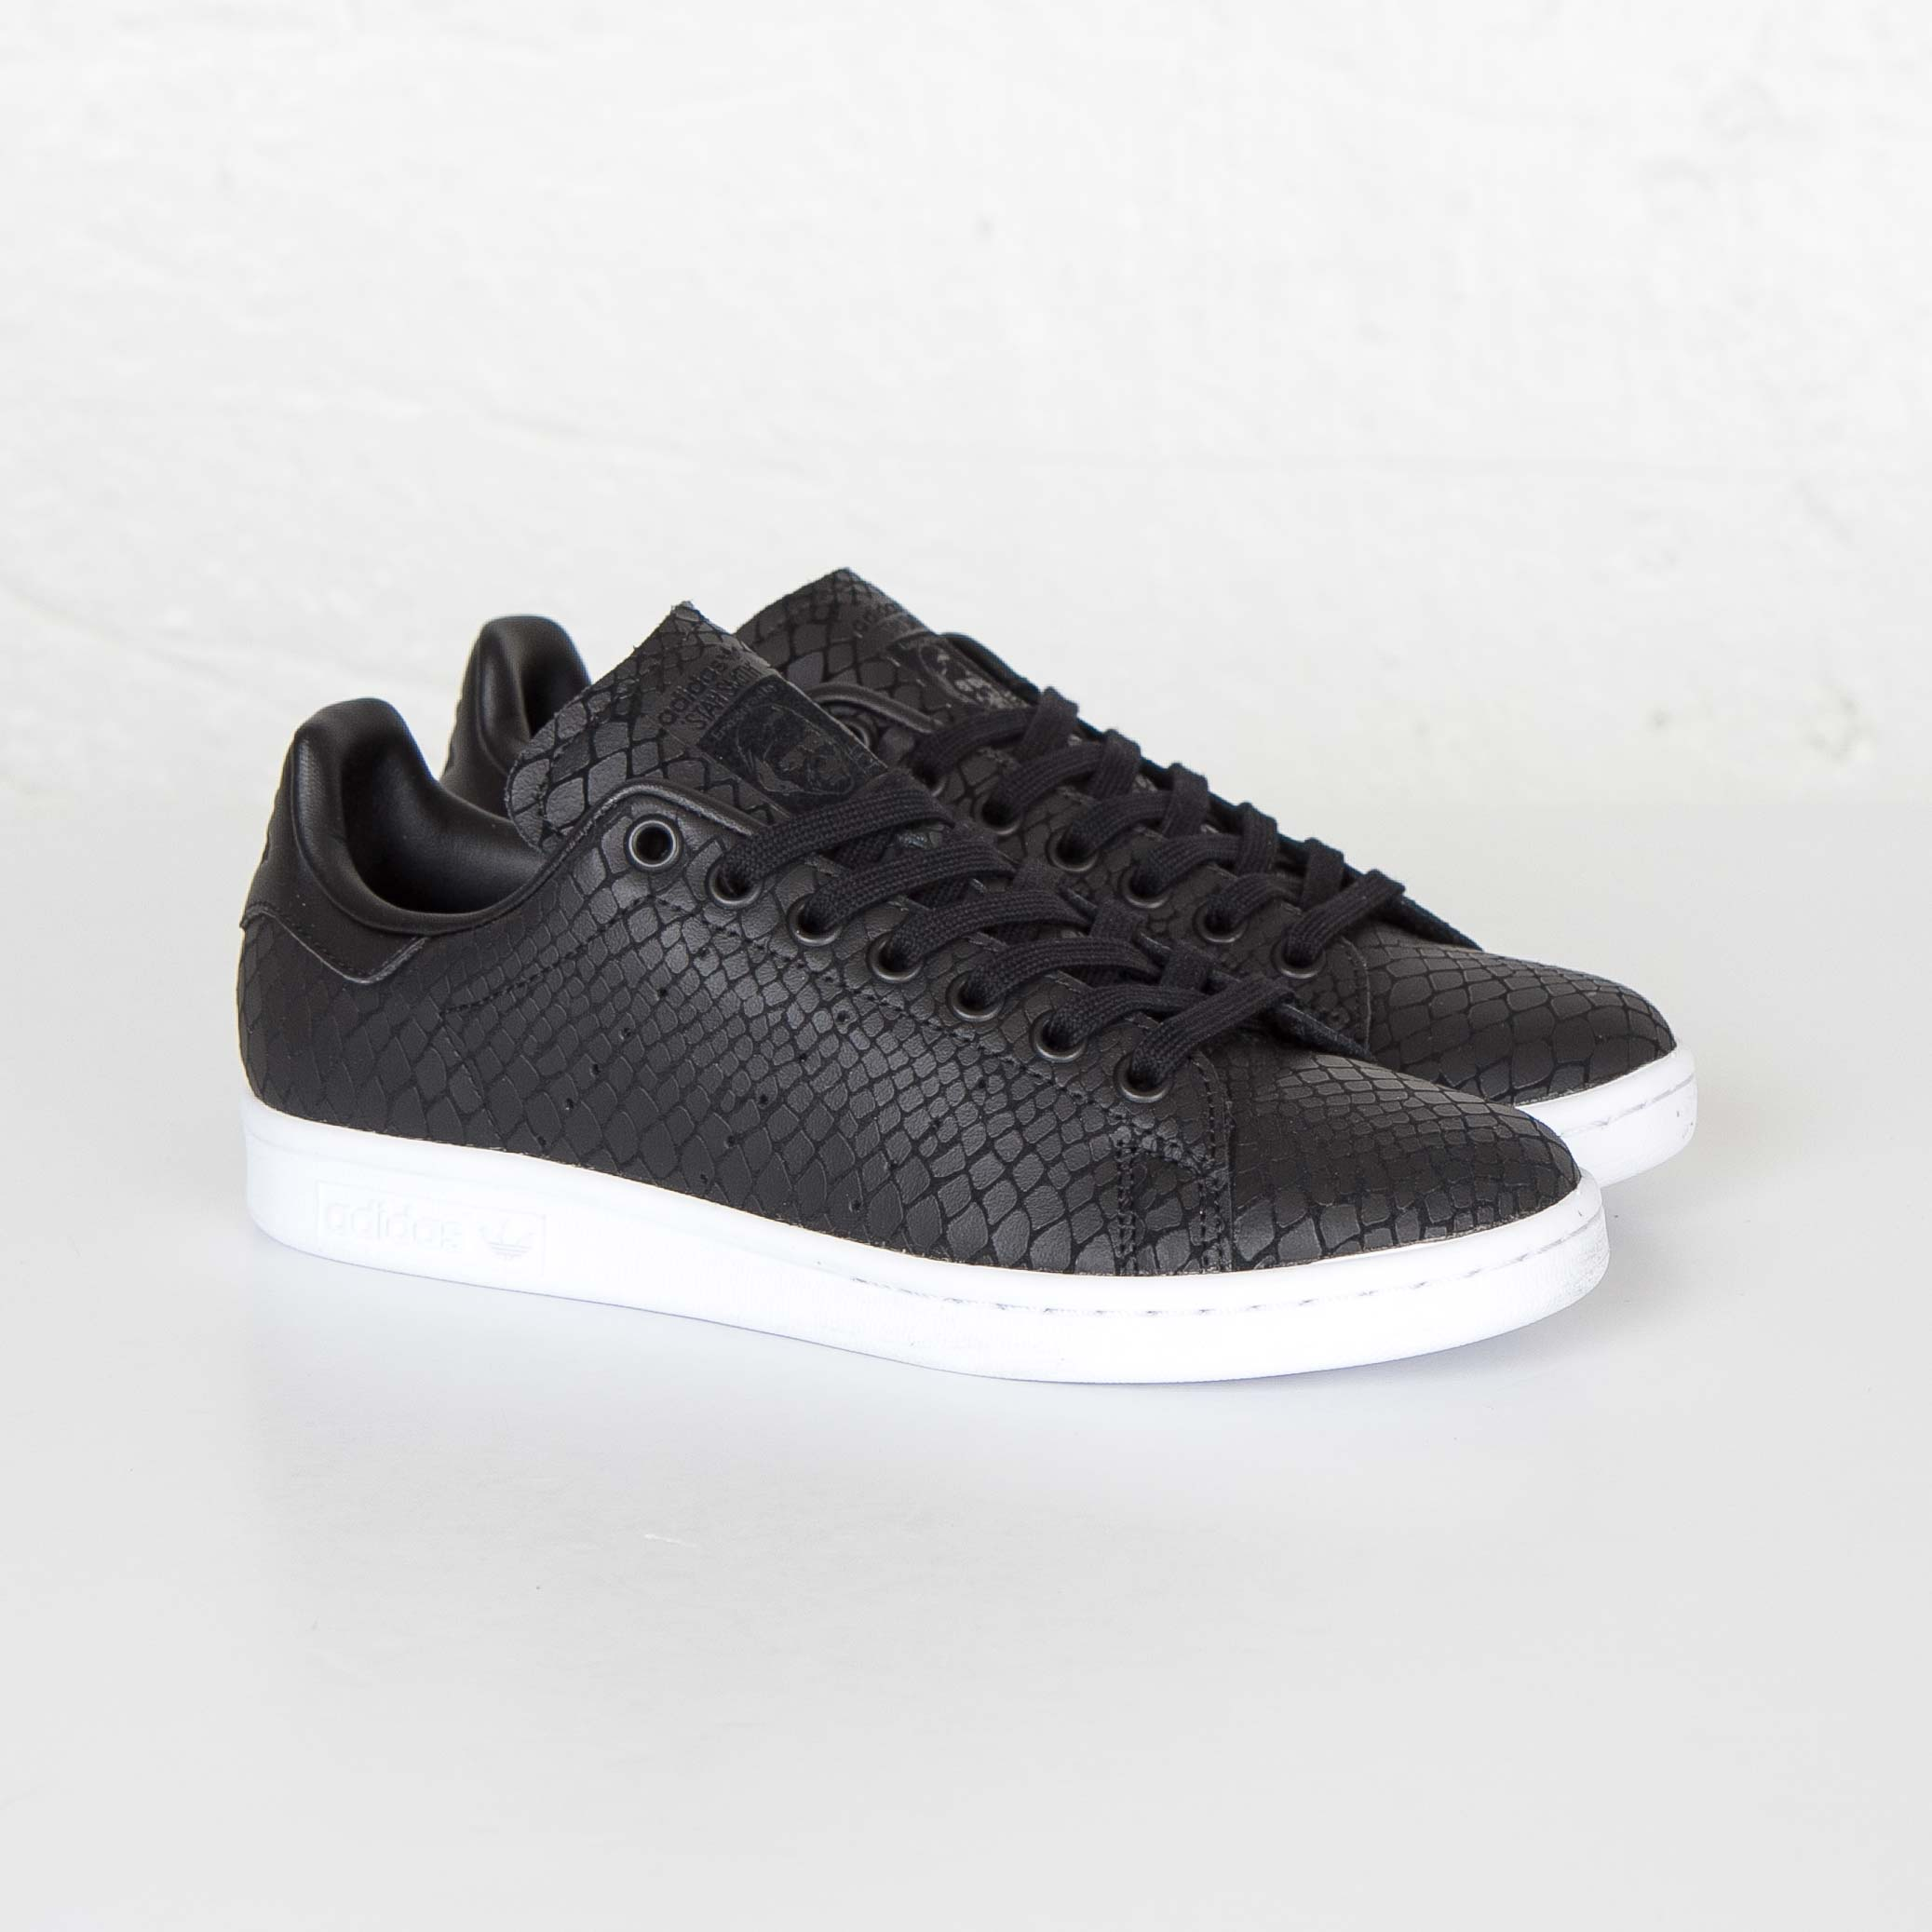 Zapatillas adidas Stan Smith W s75137 sneakersnstuff